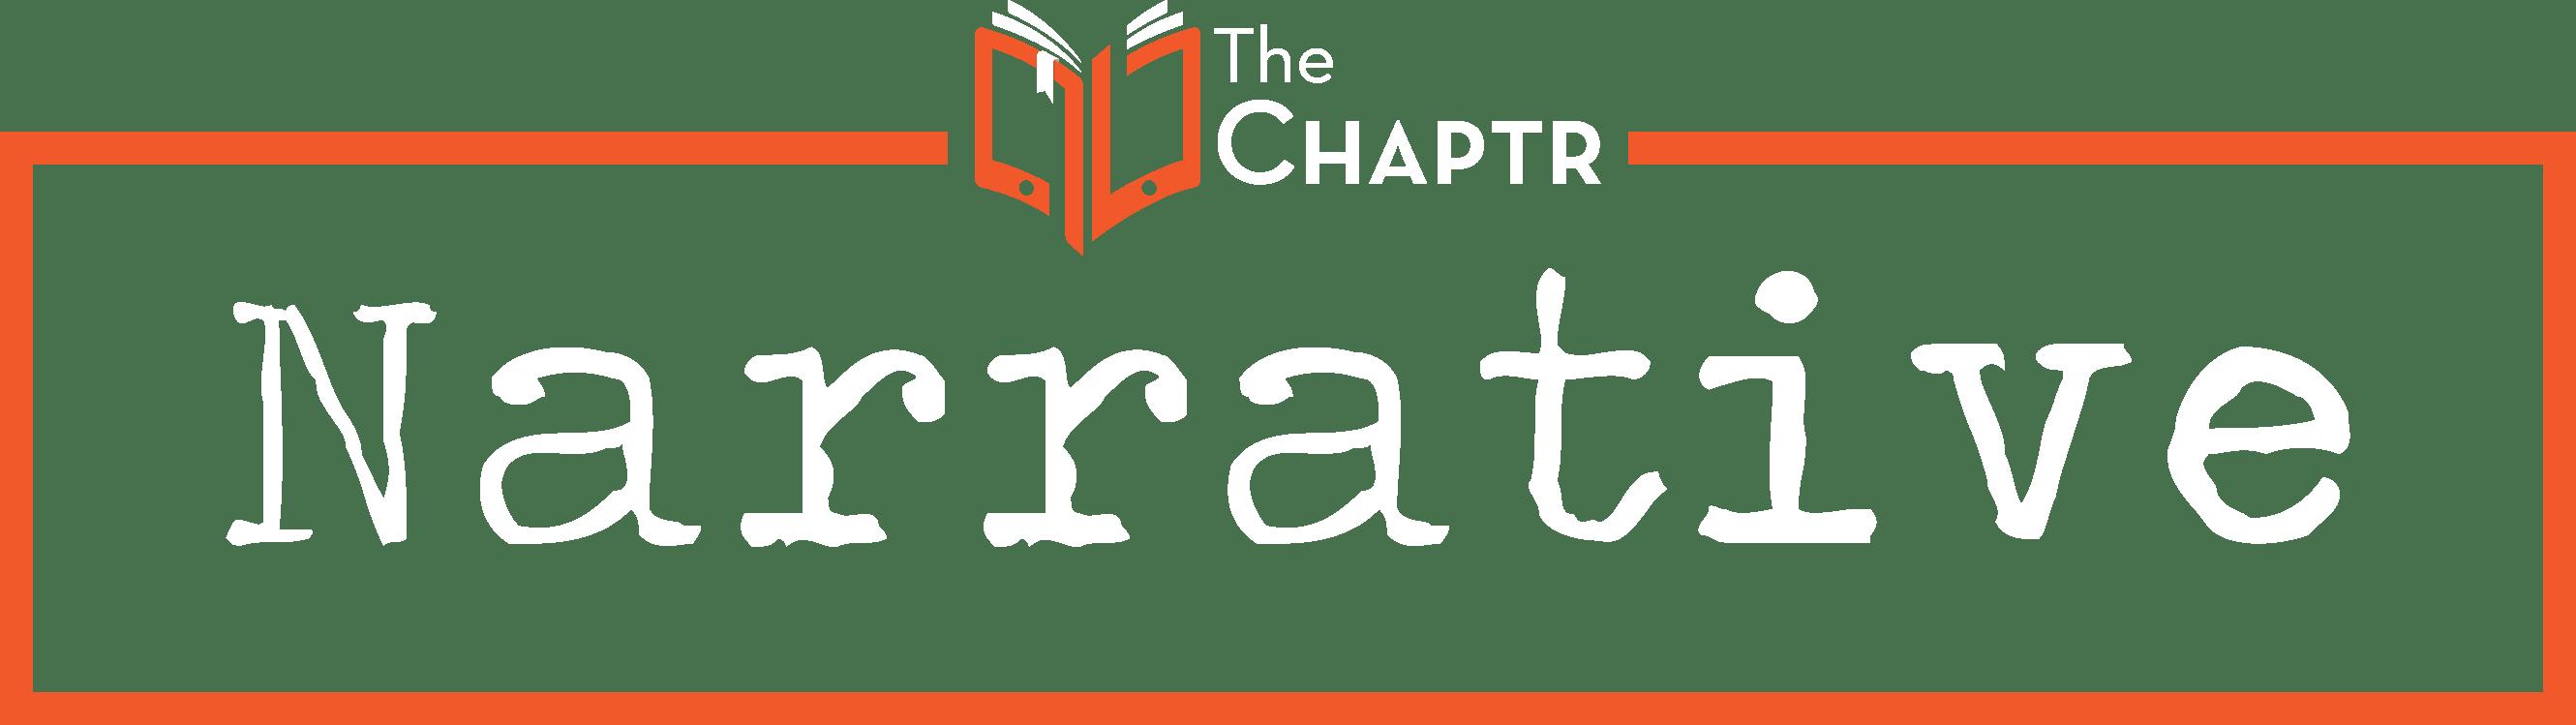 The Chaptr Narrative Logo Design-04